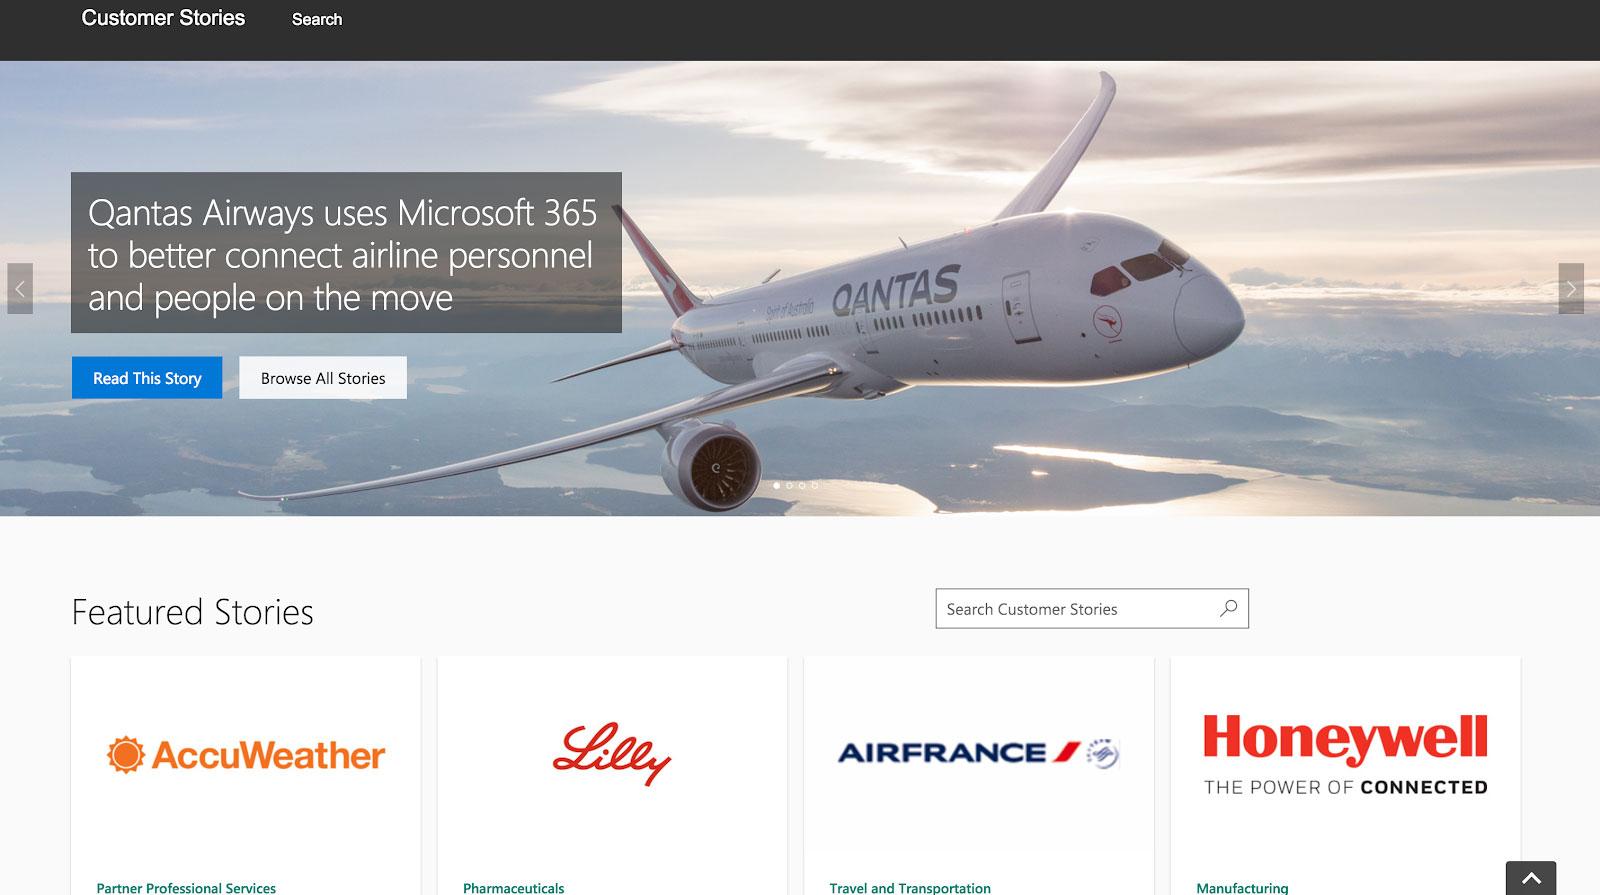 Quantas Airways Omnichannel Marketing Storytelling Example